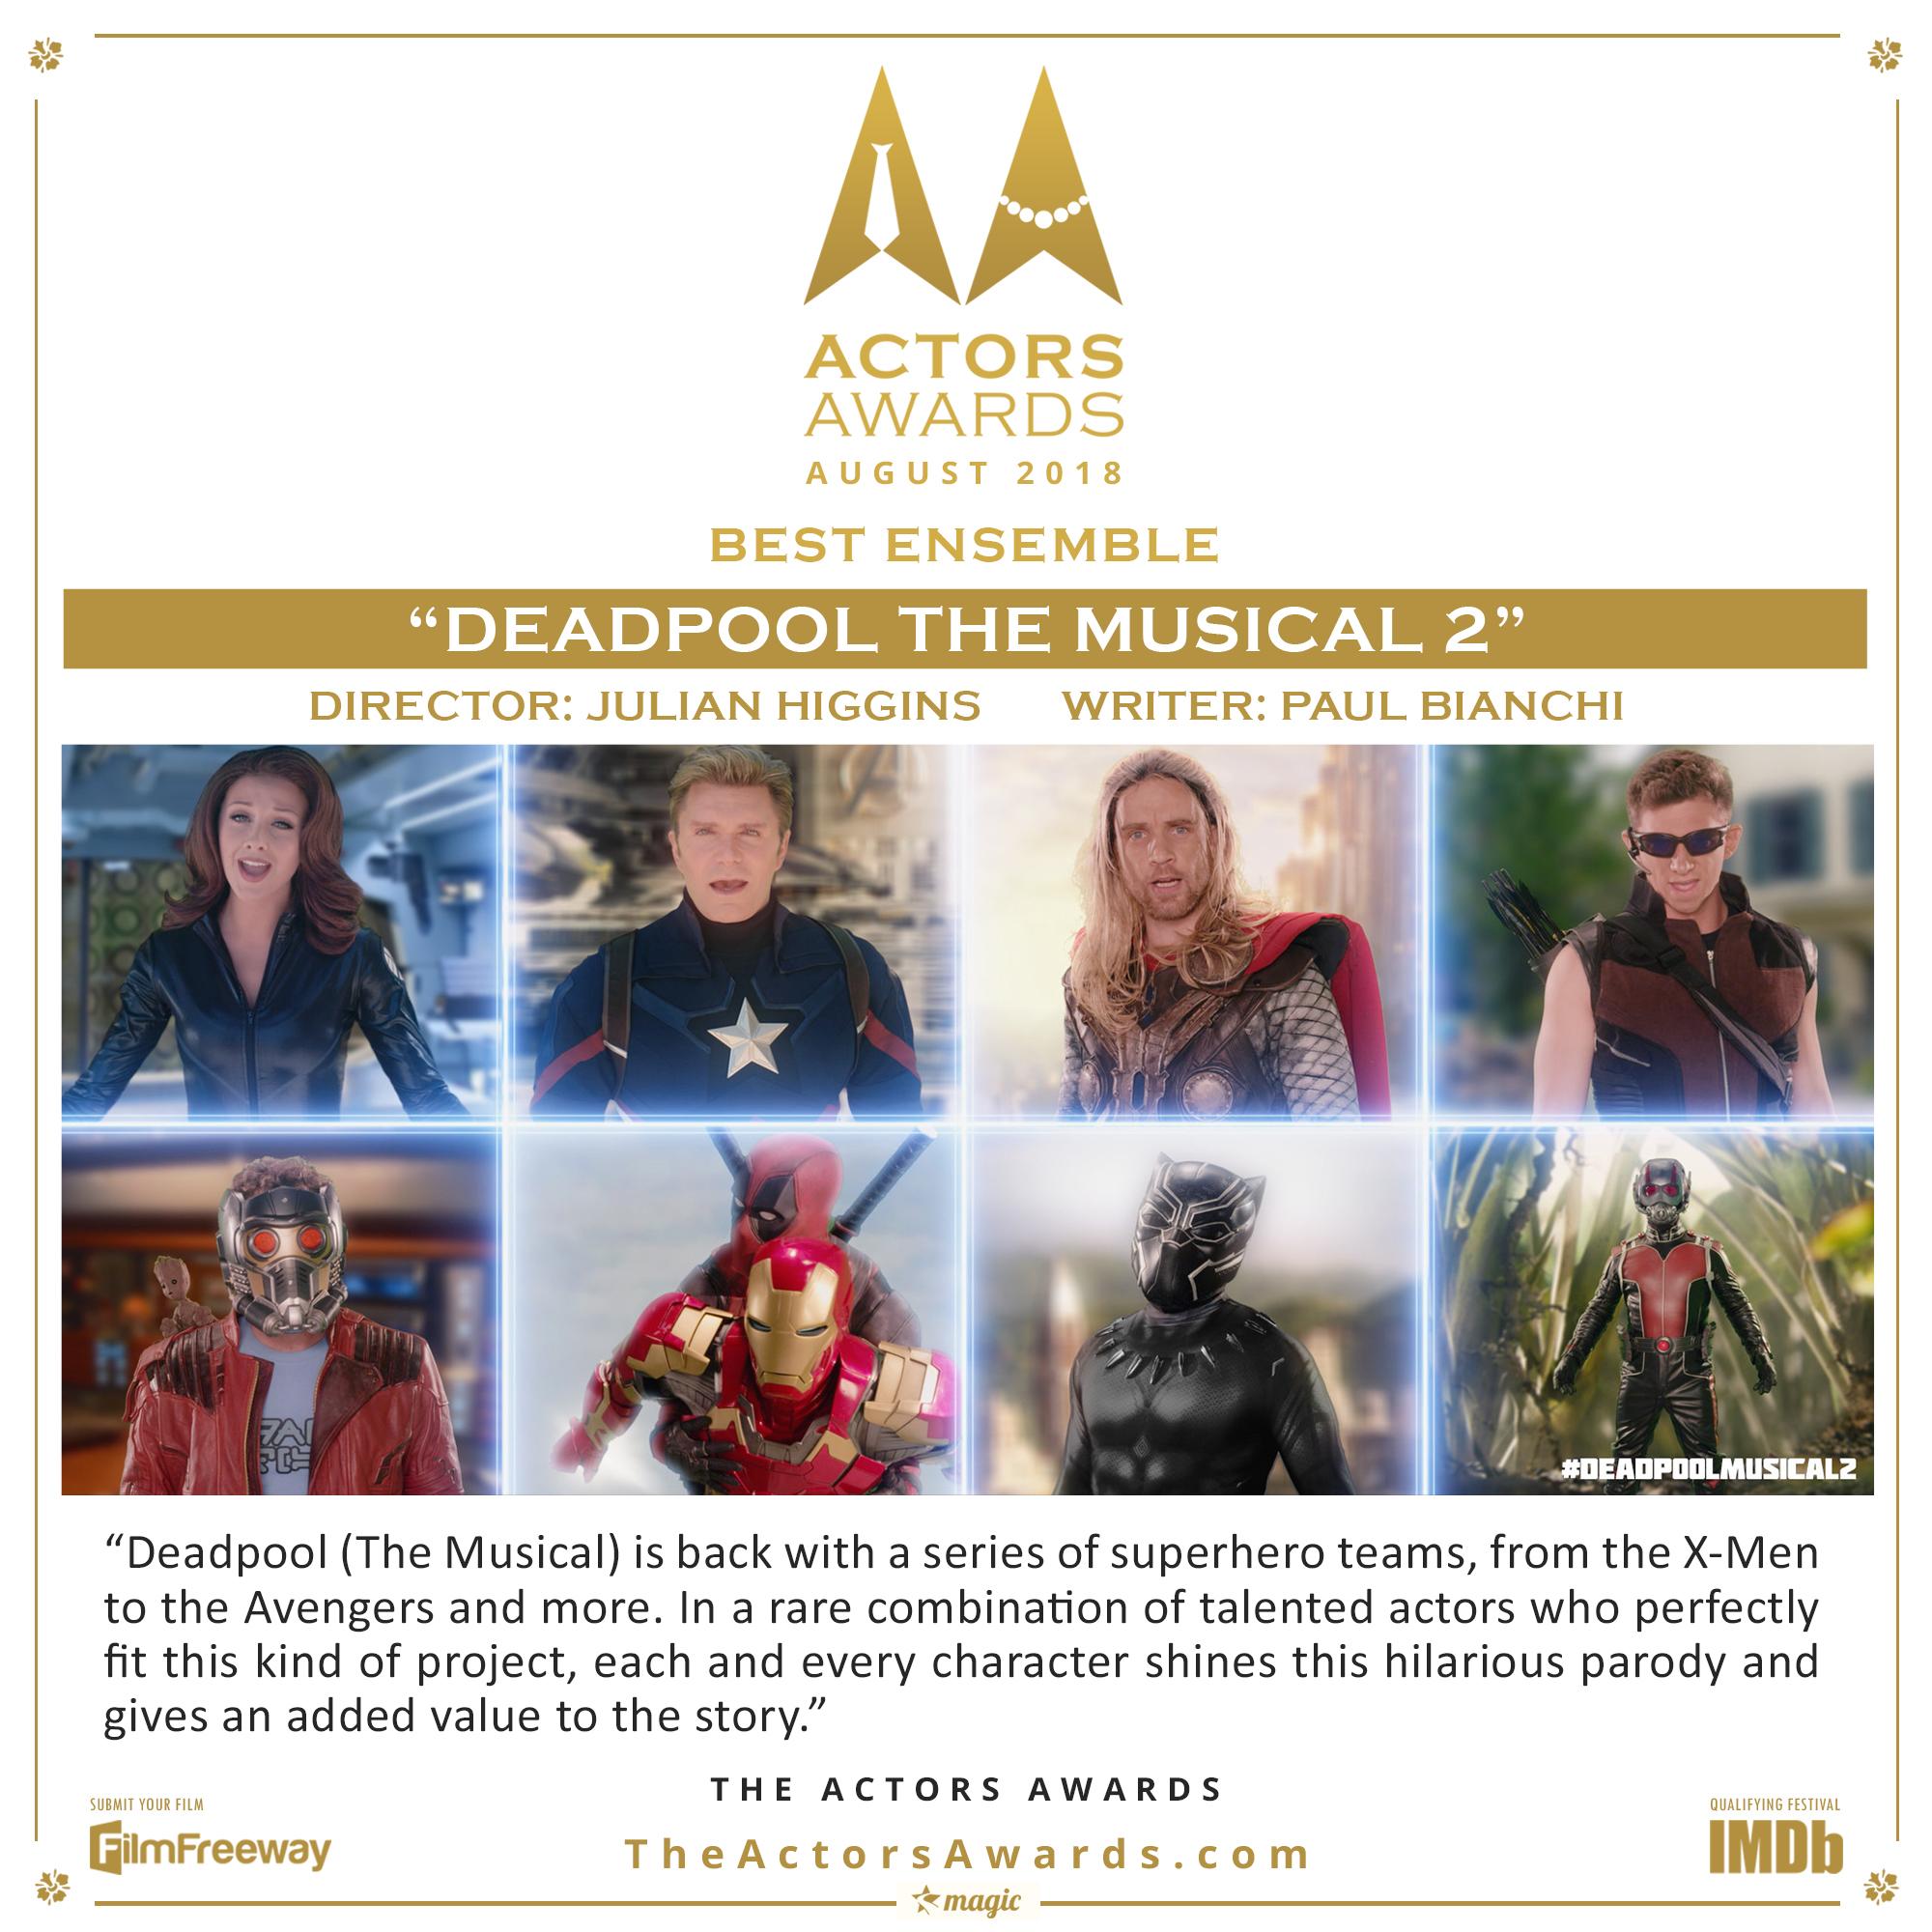 Deadpool The Musical 2 2018 08 Best Ense